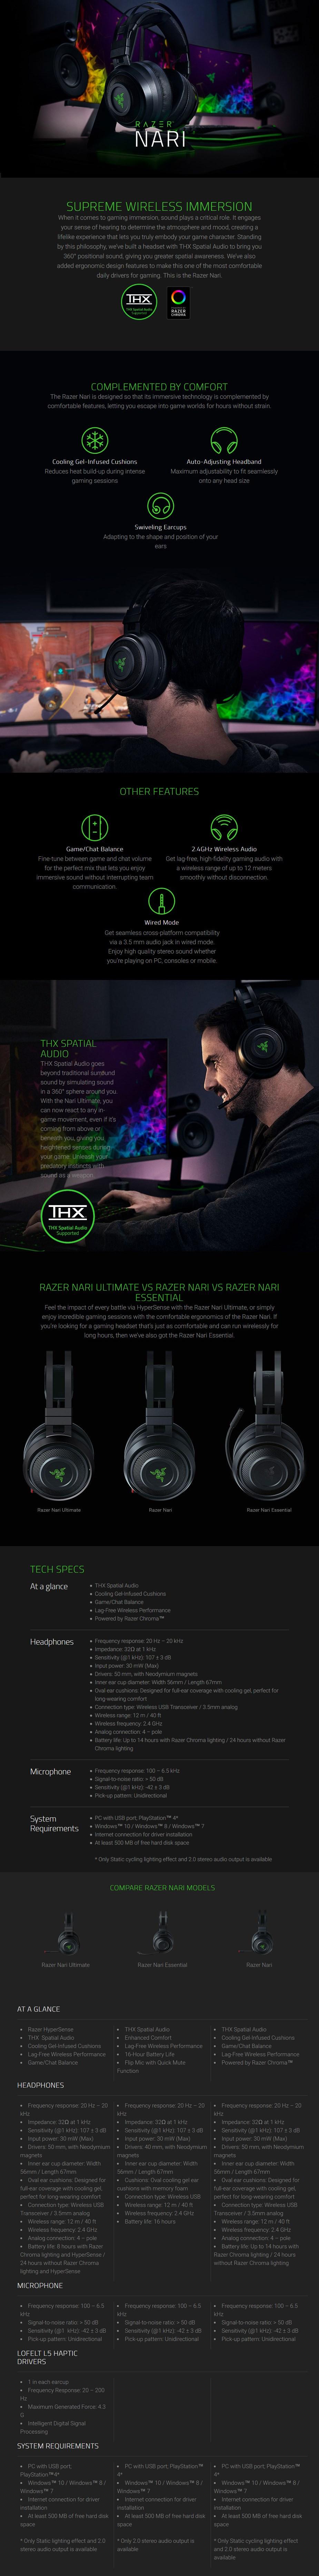 Razer Nari Wireless Gaming Headset - Desktop Overview 1